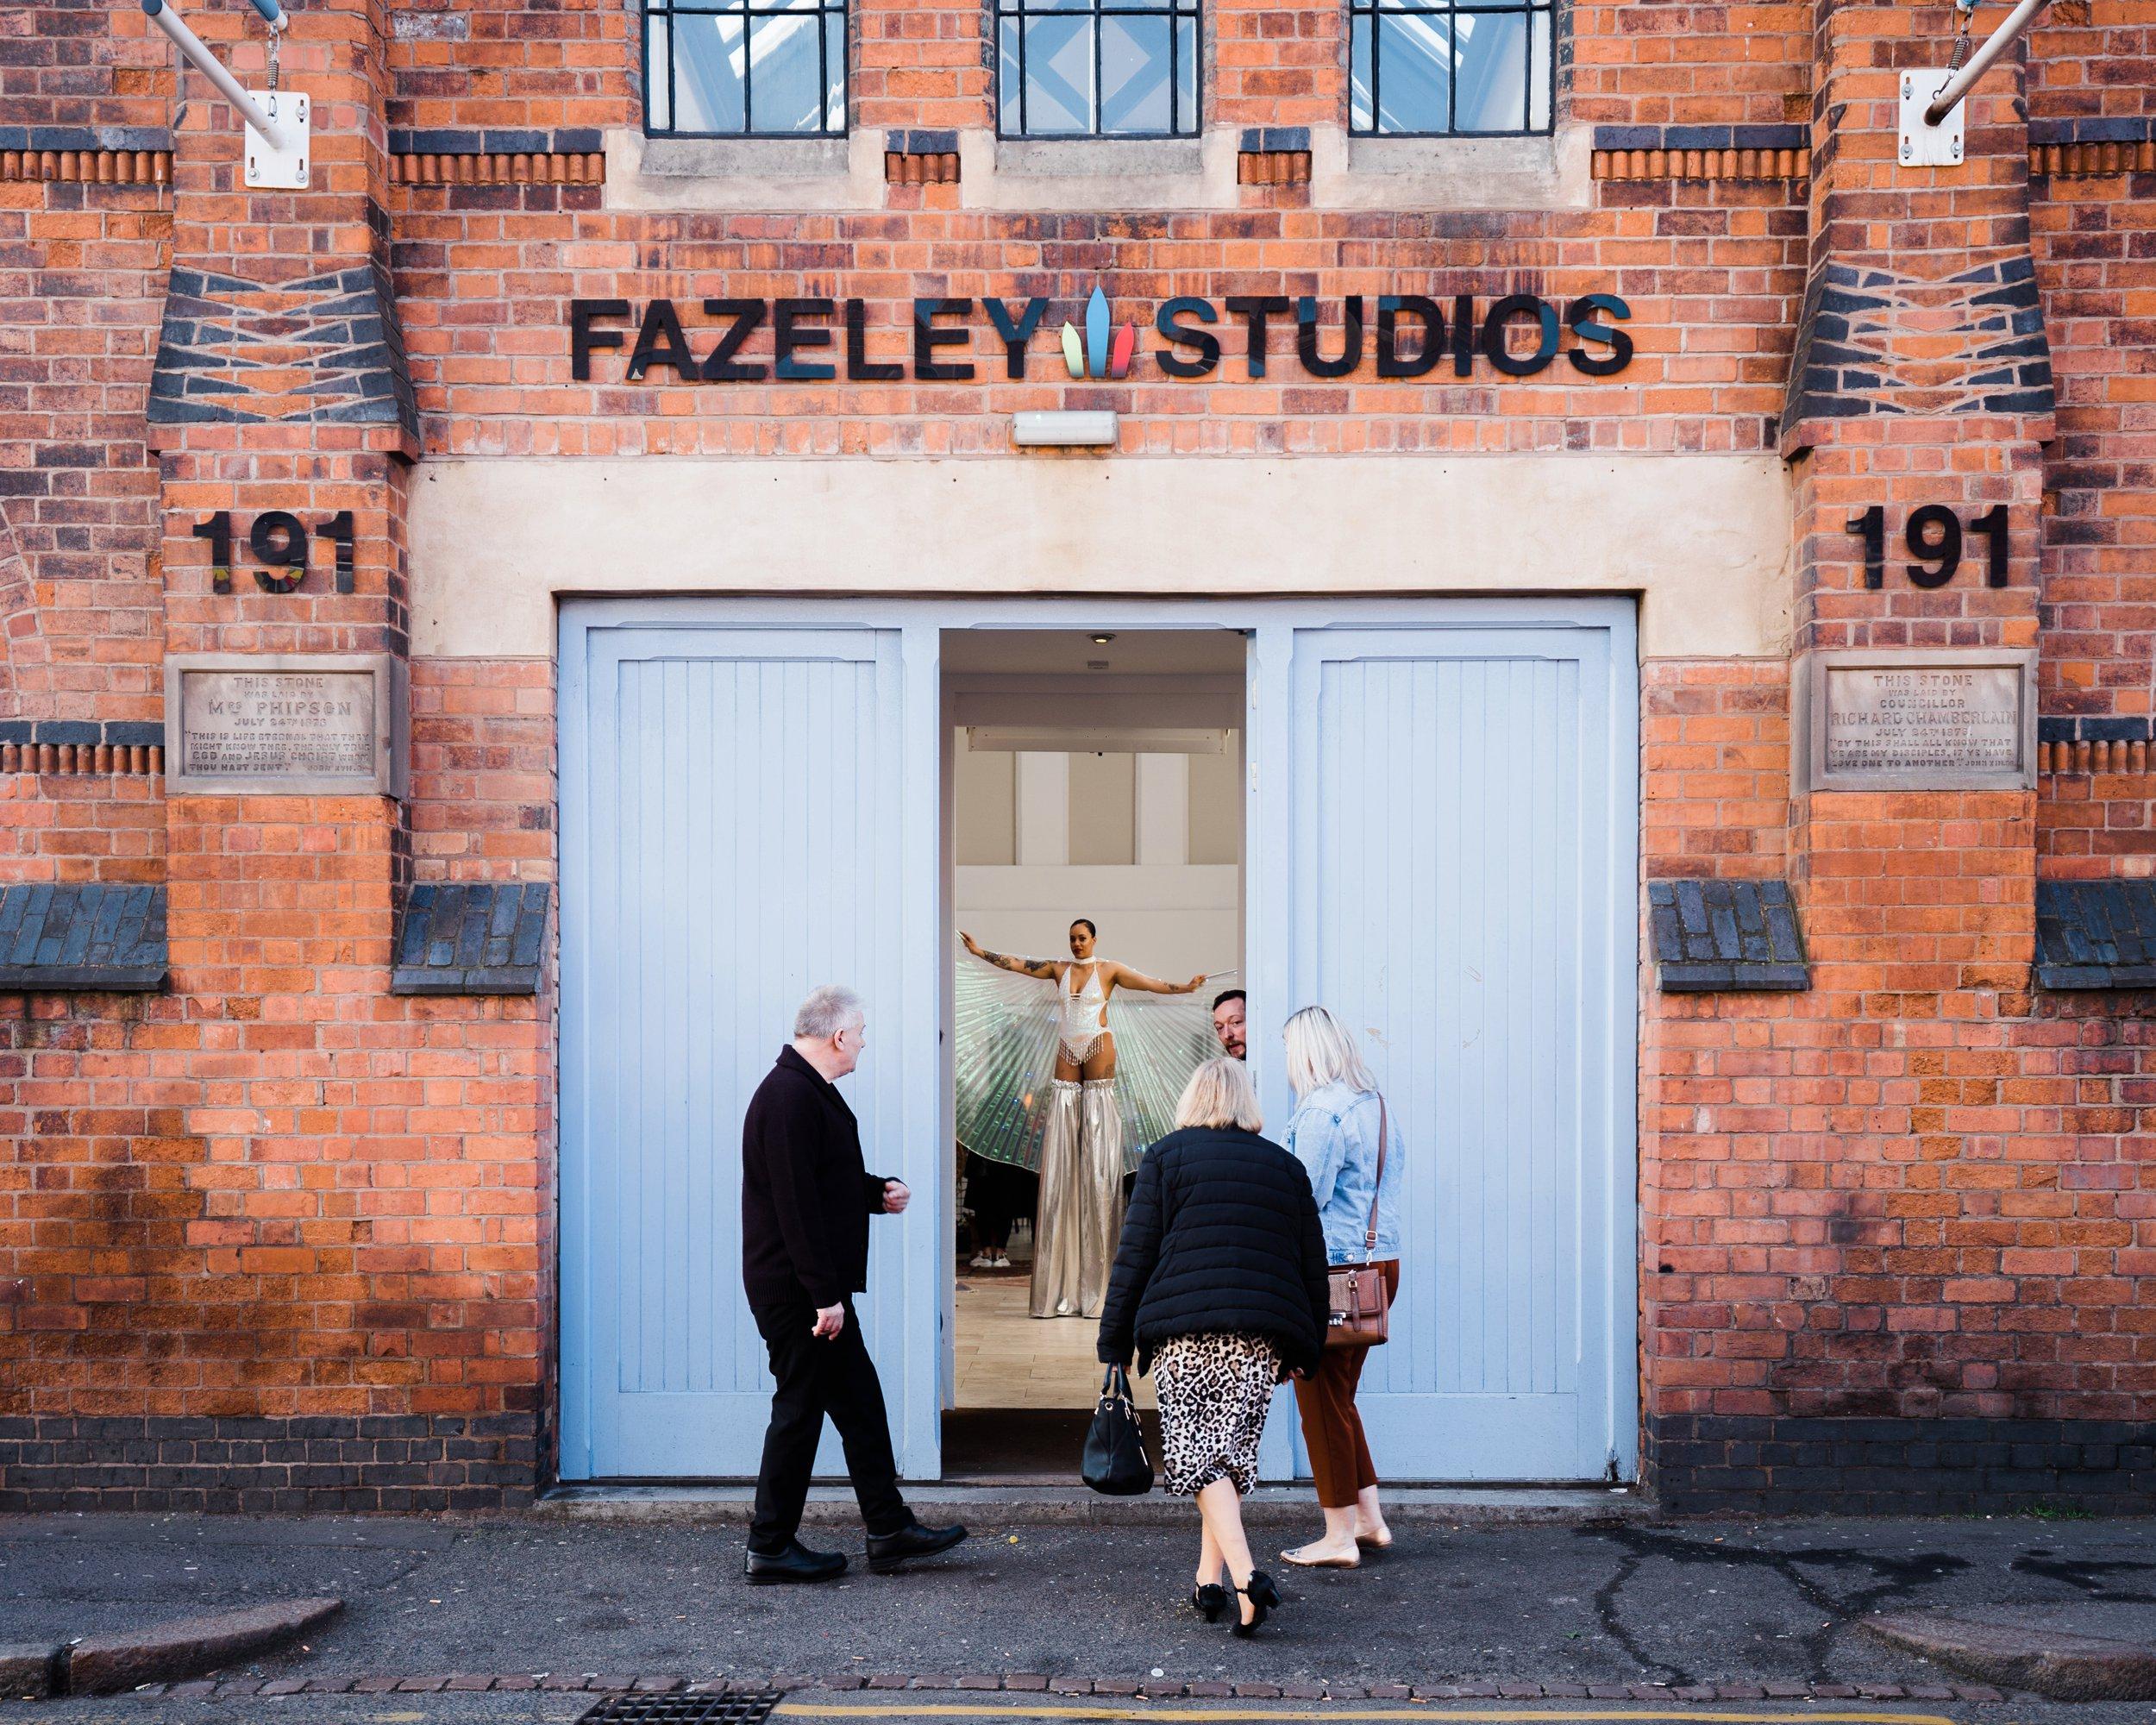 The UN-WEDDING SHOW 2019 cool bride style modern wedding fair Birmingham Fazeley Studios 00005.jpg